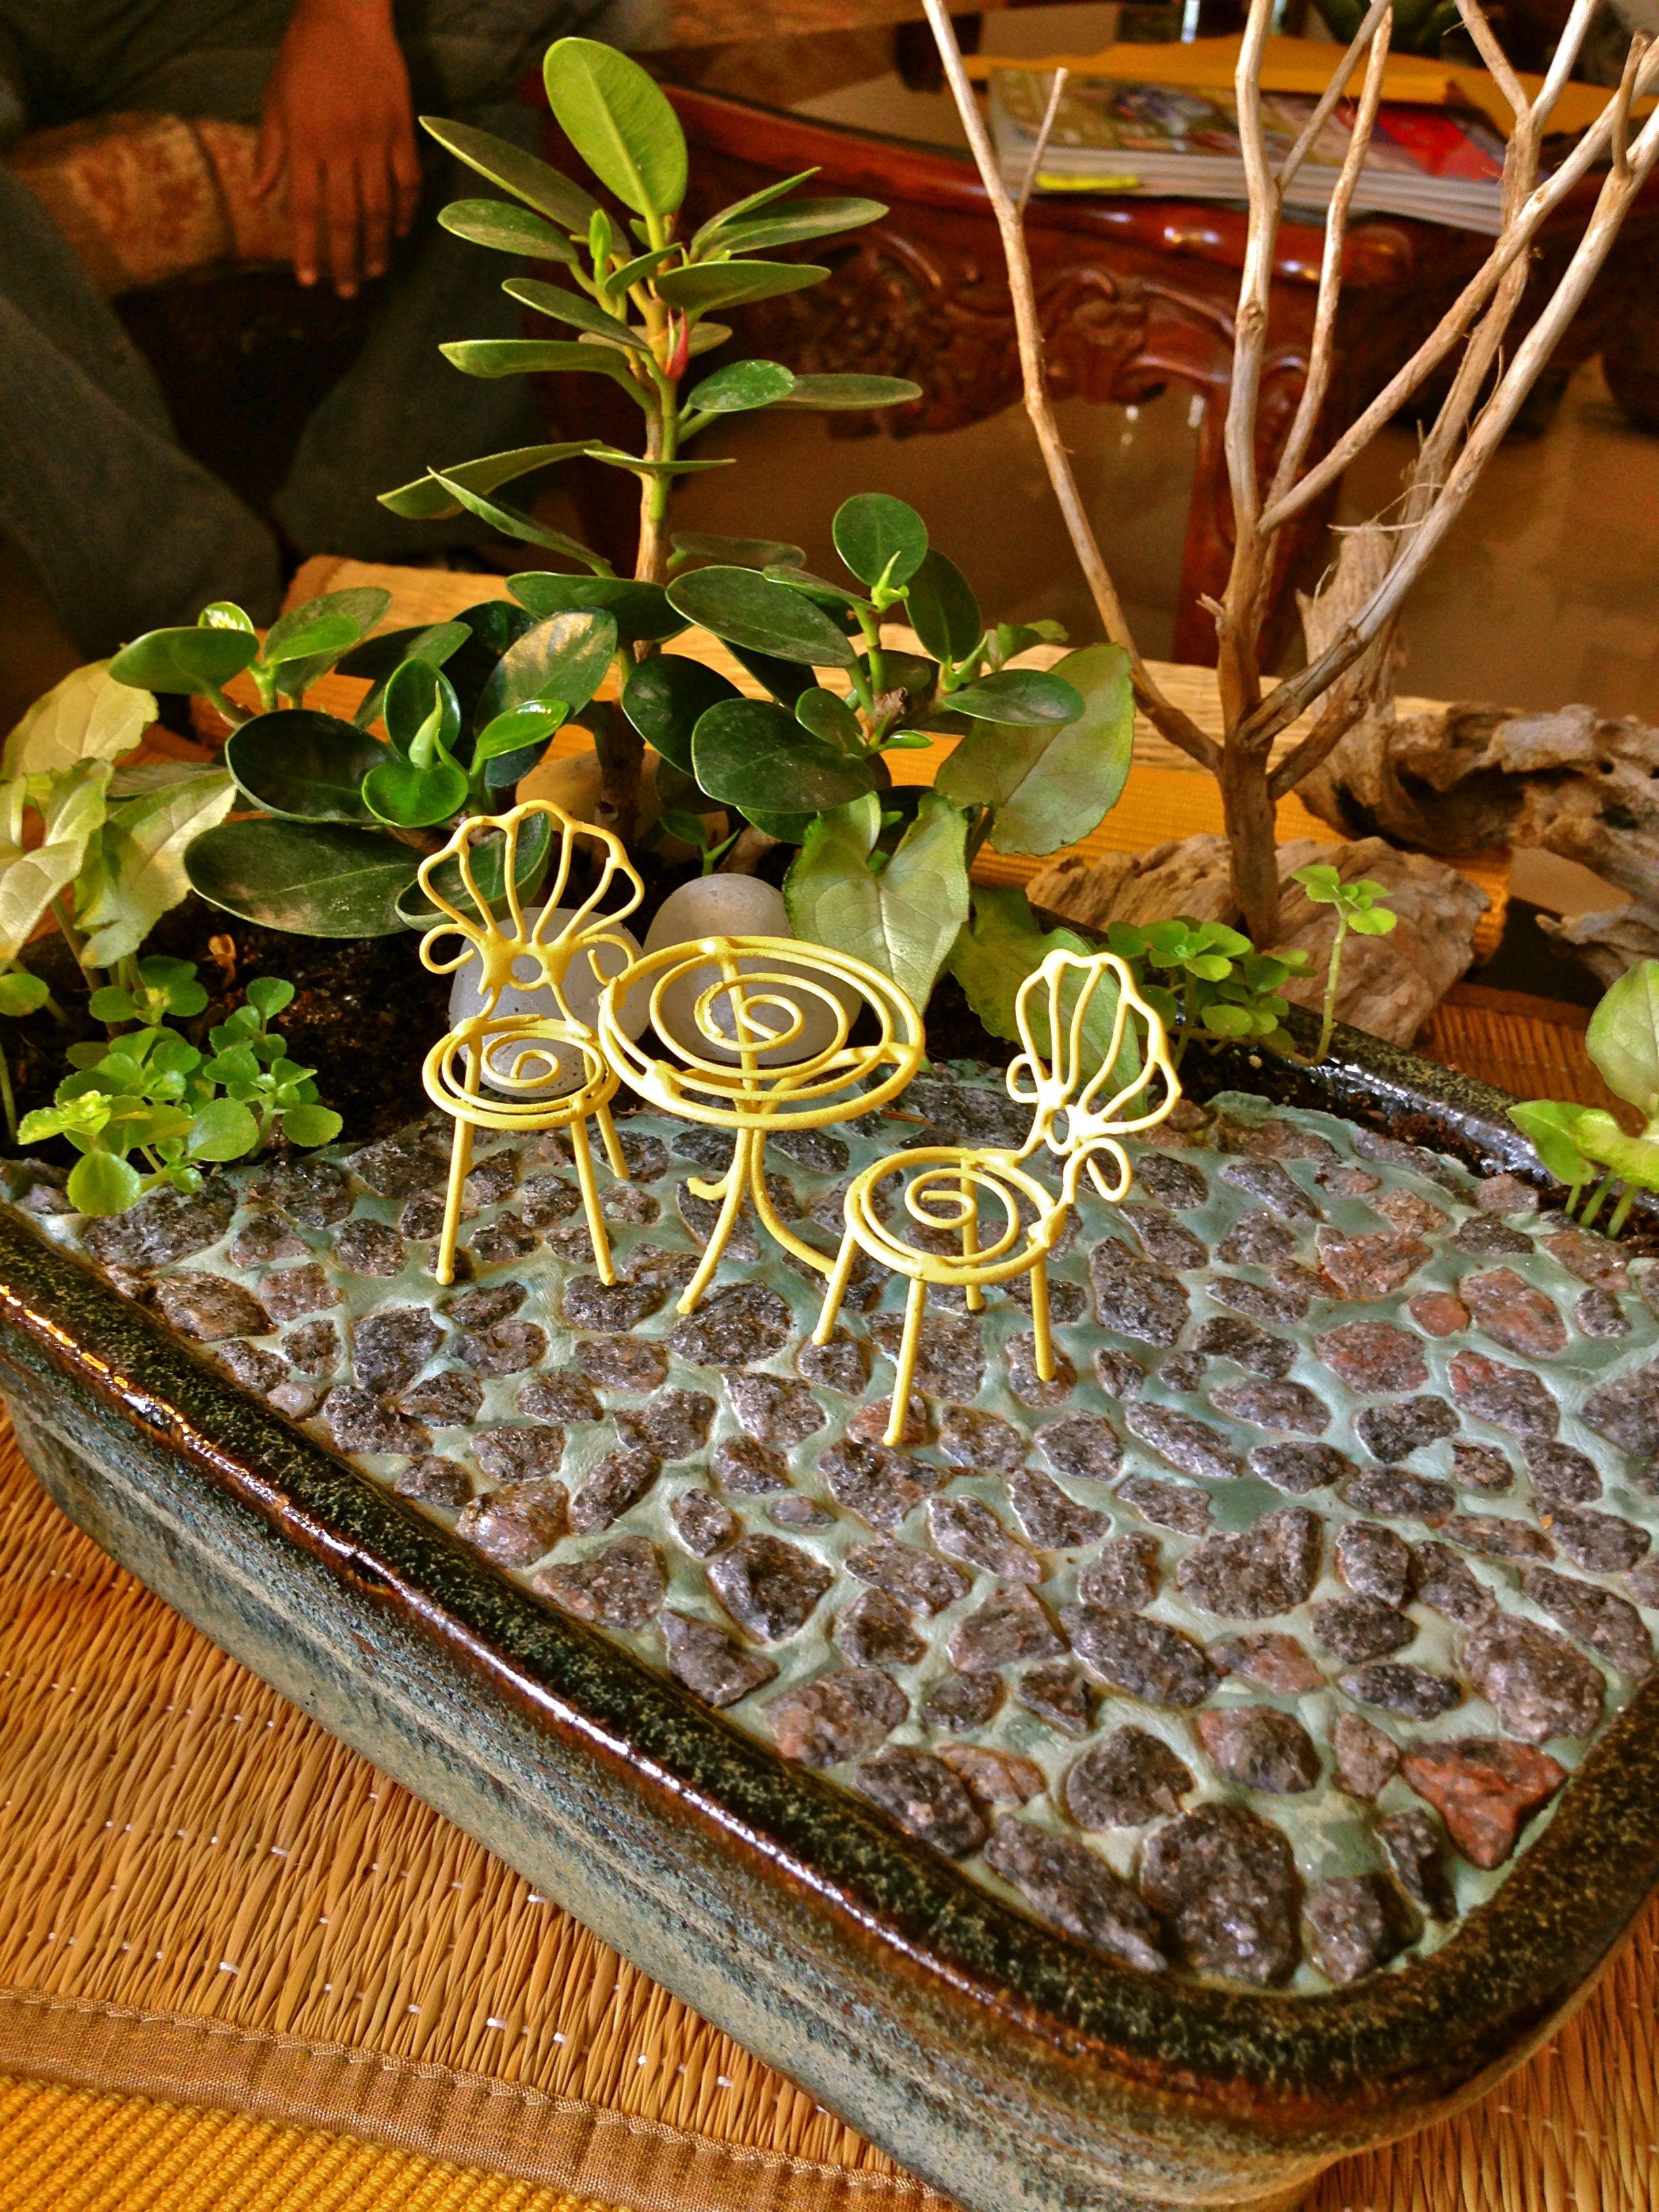 e of our Miniature Gardens from the Secret Garden Collection